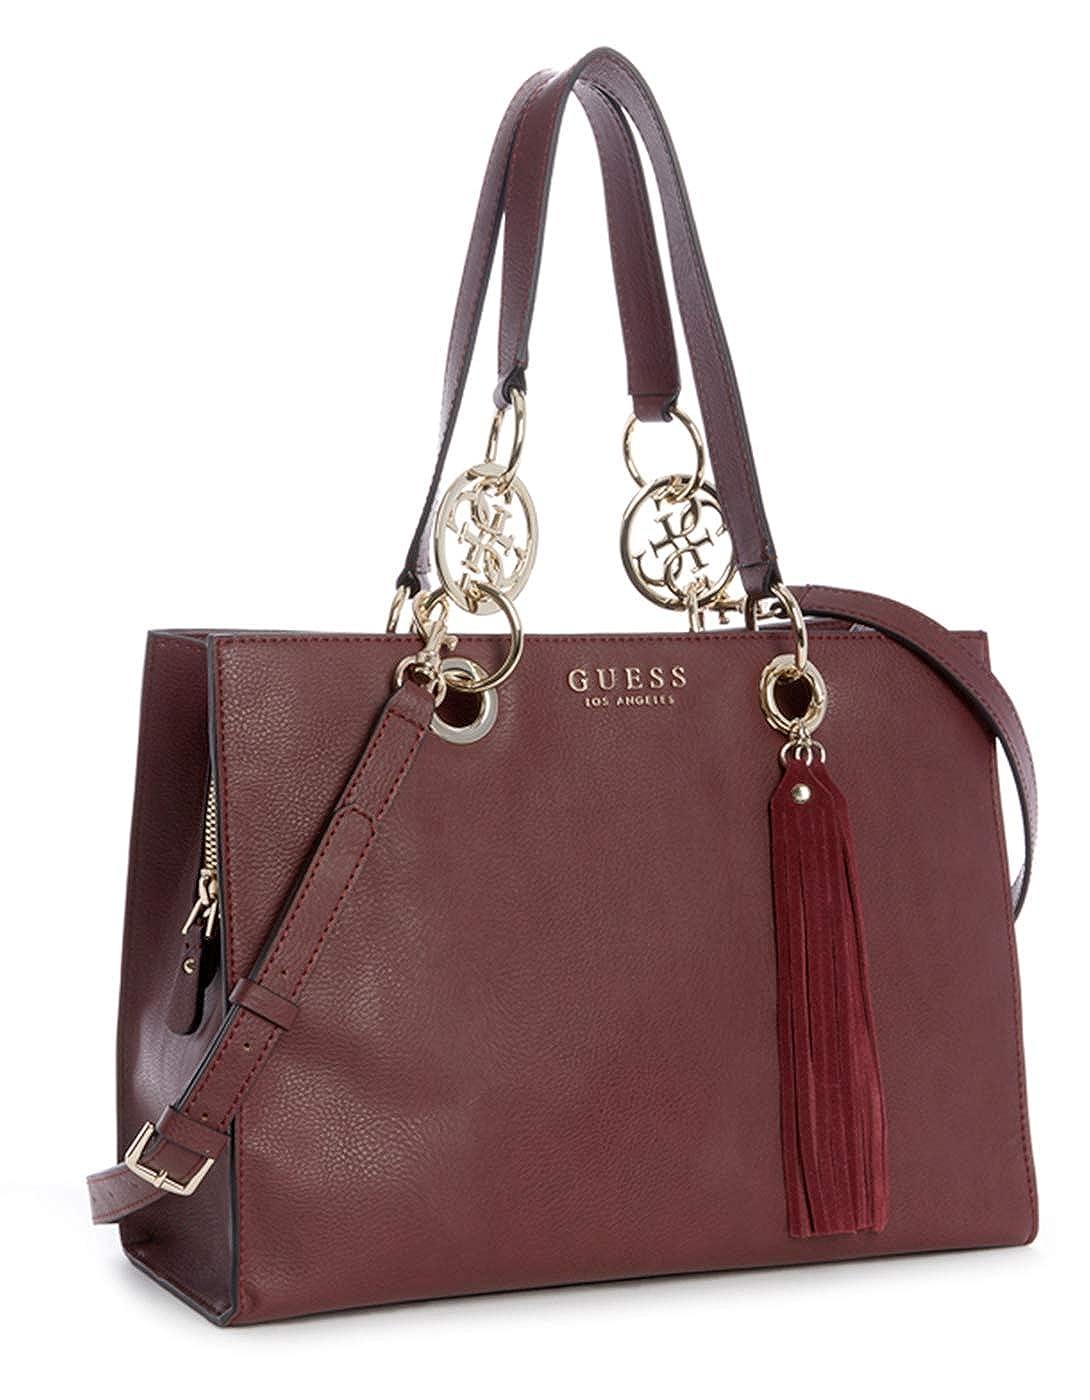 Guess burgundy bag ALANA GIRLFRIEND (One Size Mauve